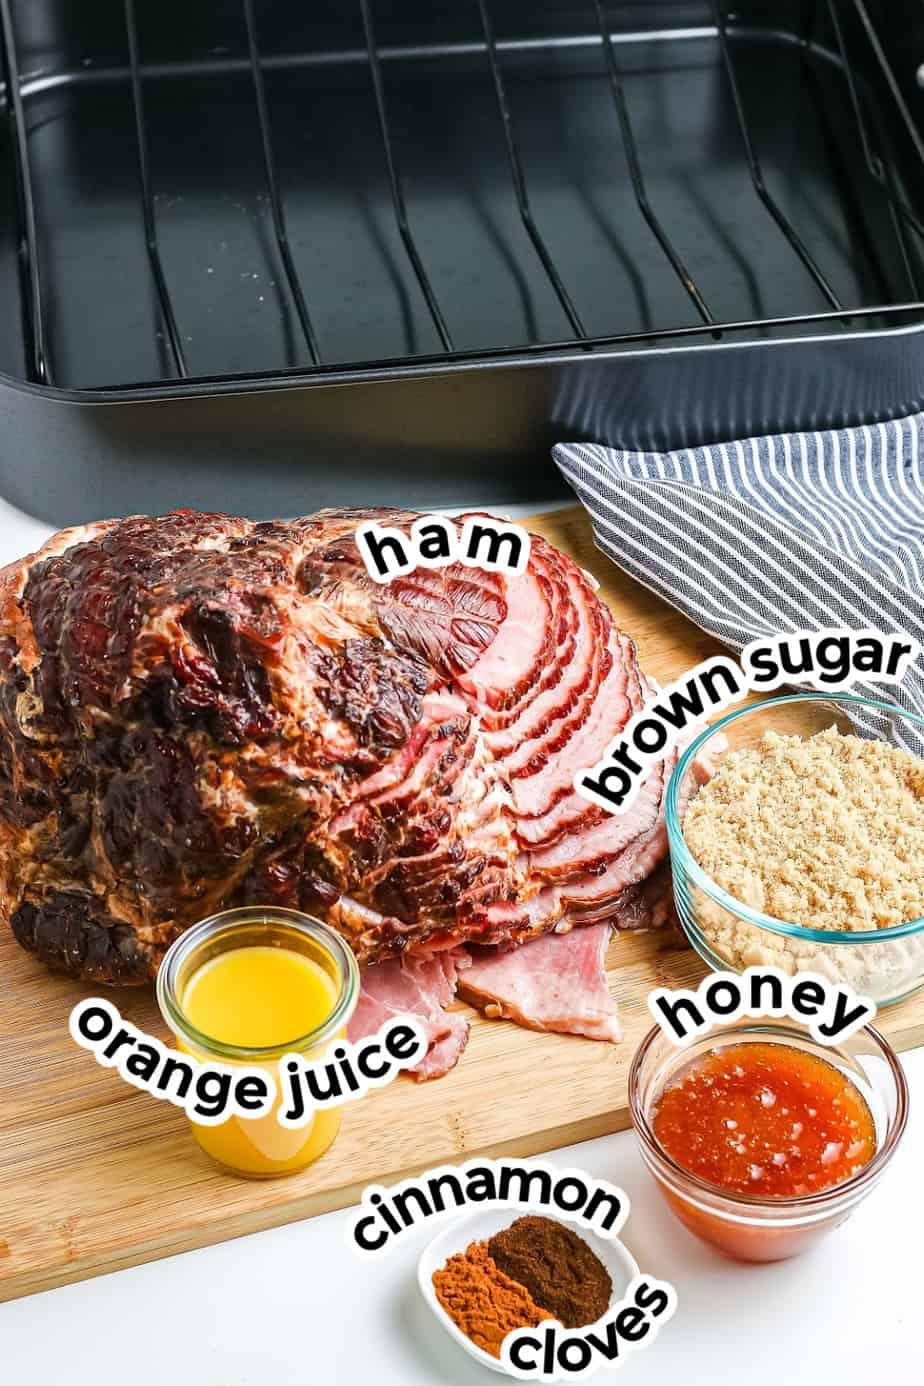 Ingredients for honey baked spiral ham